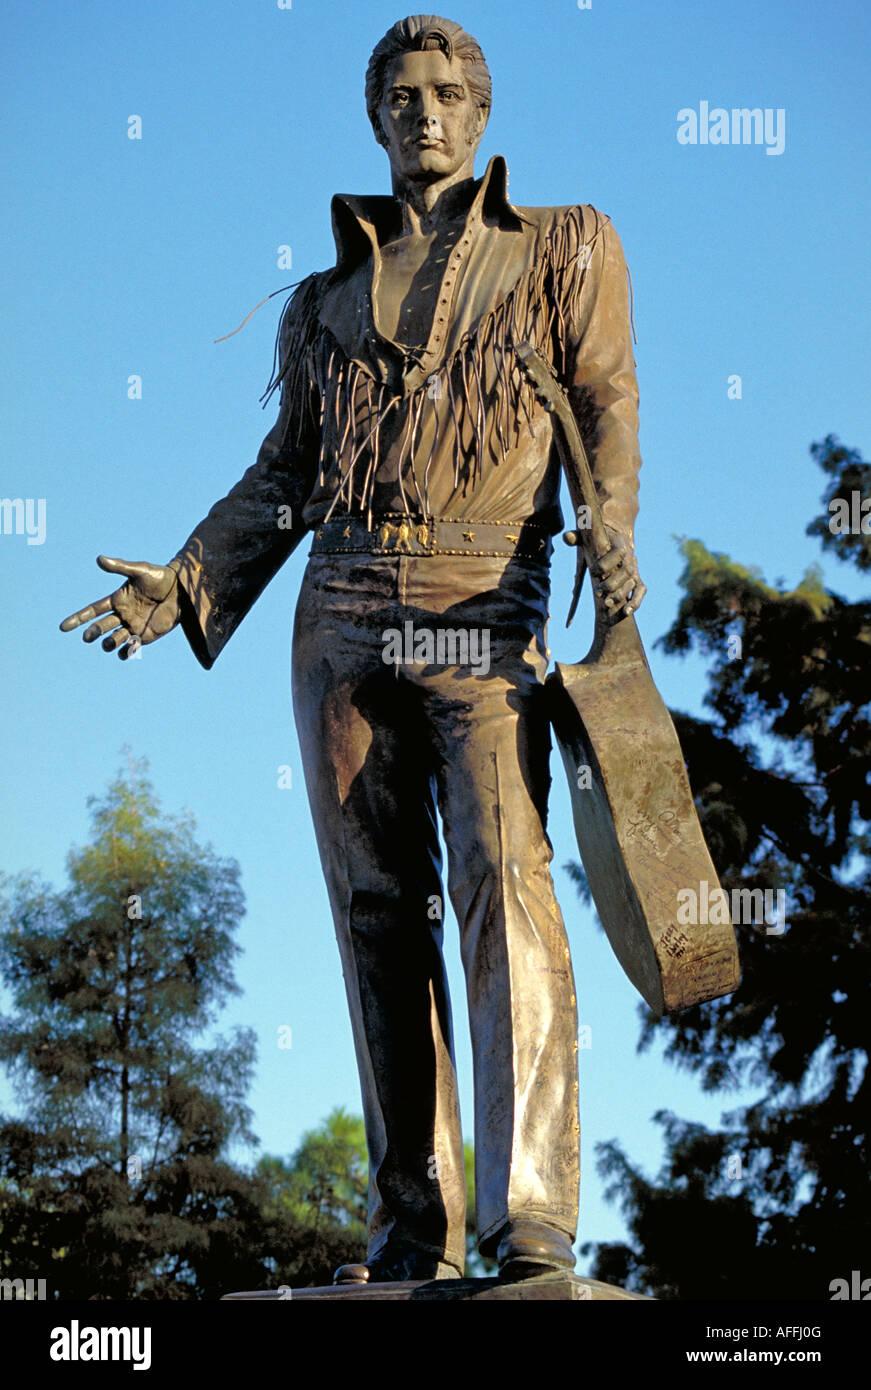 Elk217 1806 Tennessee Memphis statue of Elvis Presley Stock Photo